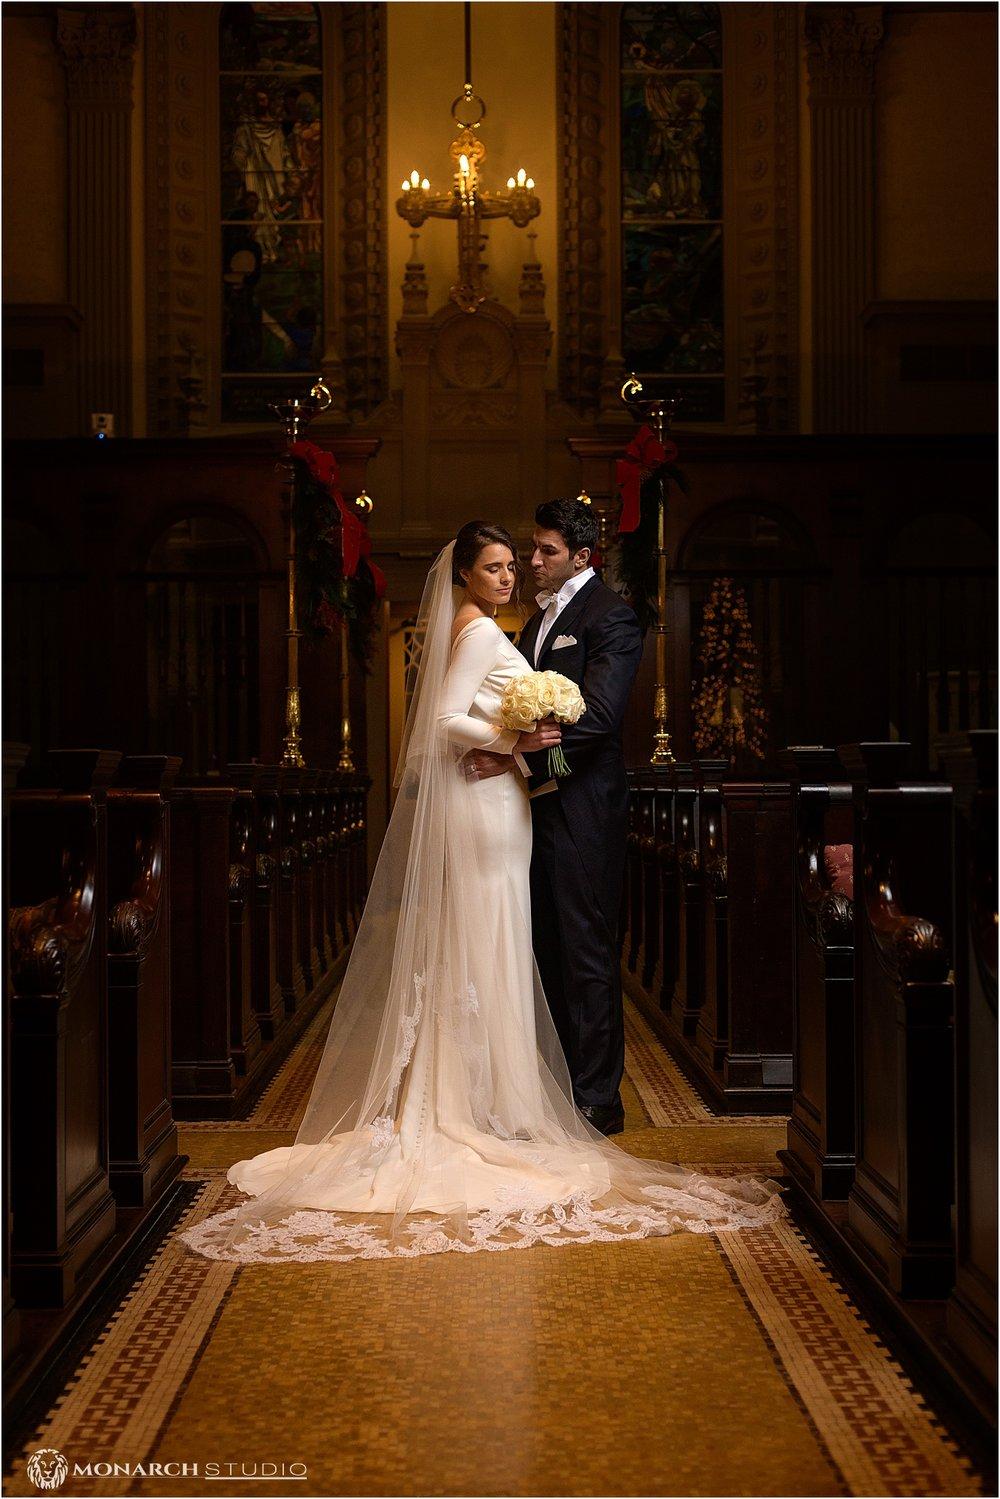 Eva and Peter's beautiful wedding portrait in the Historic Memorial Presbyterian Church.